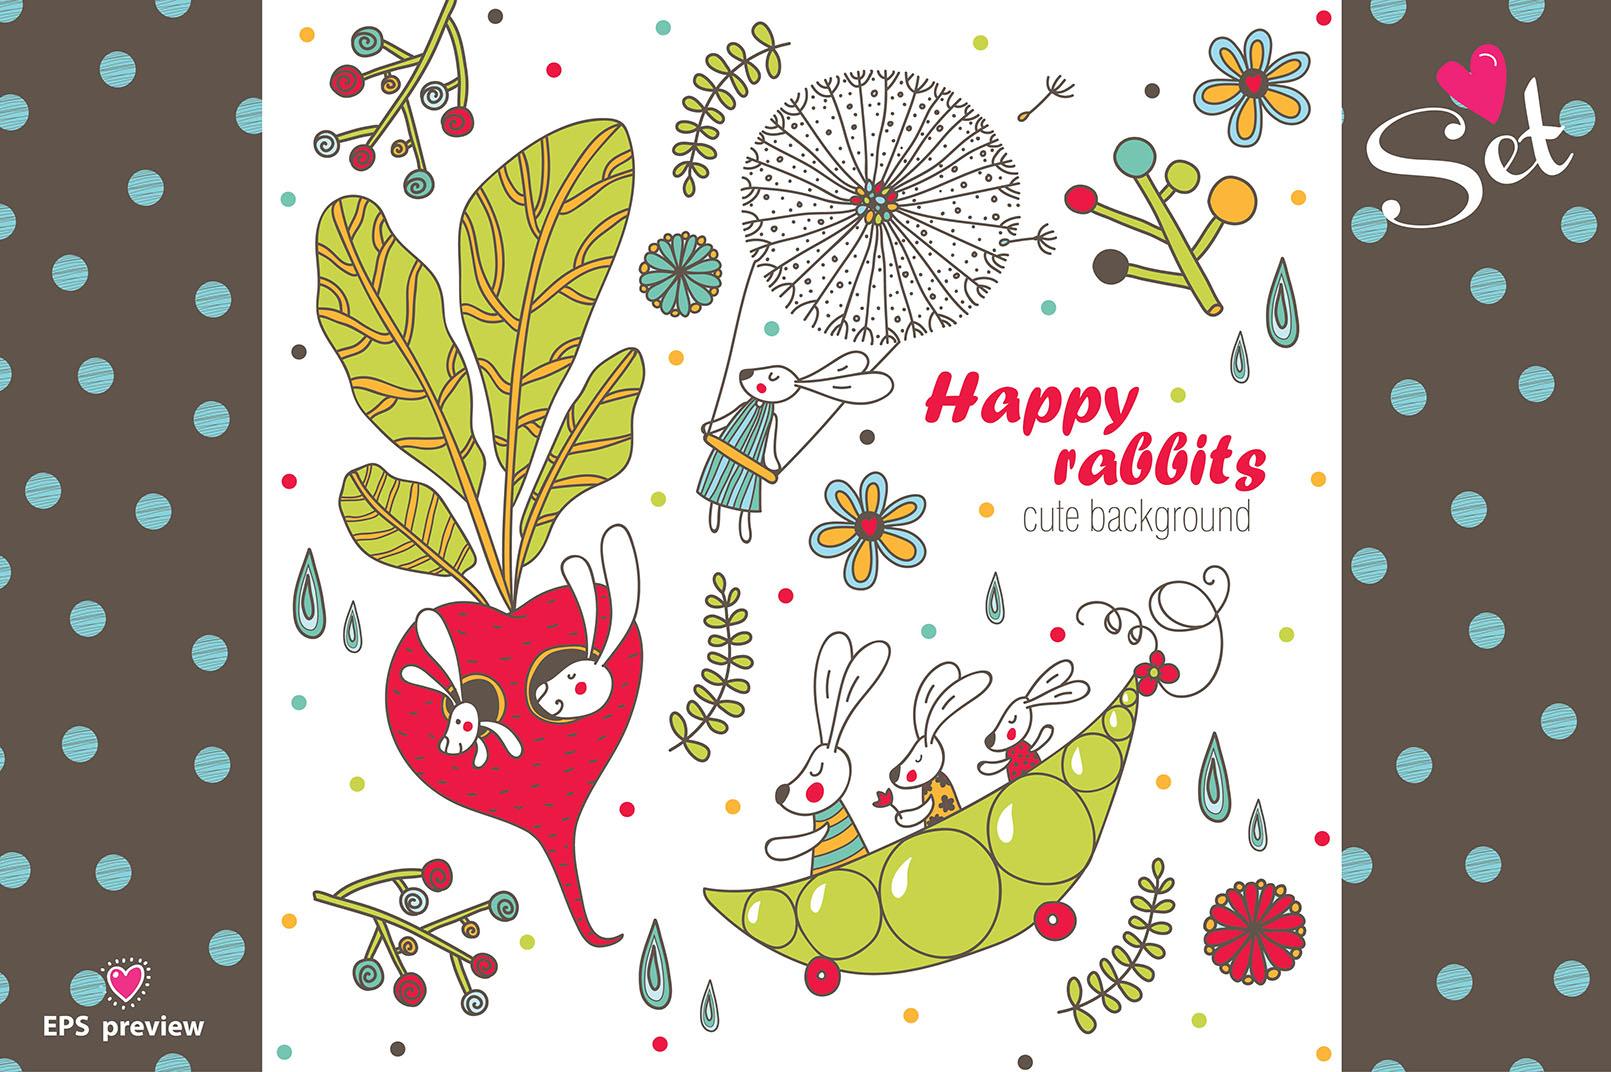 Happy rabbits! example image 8